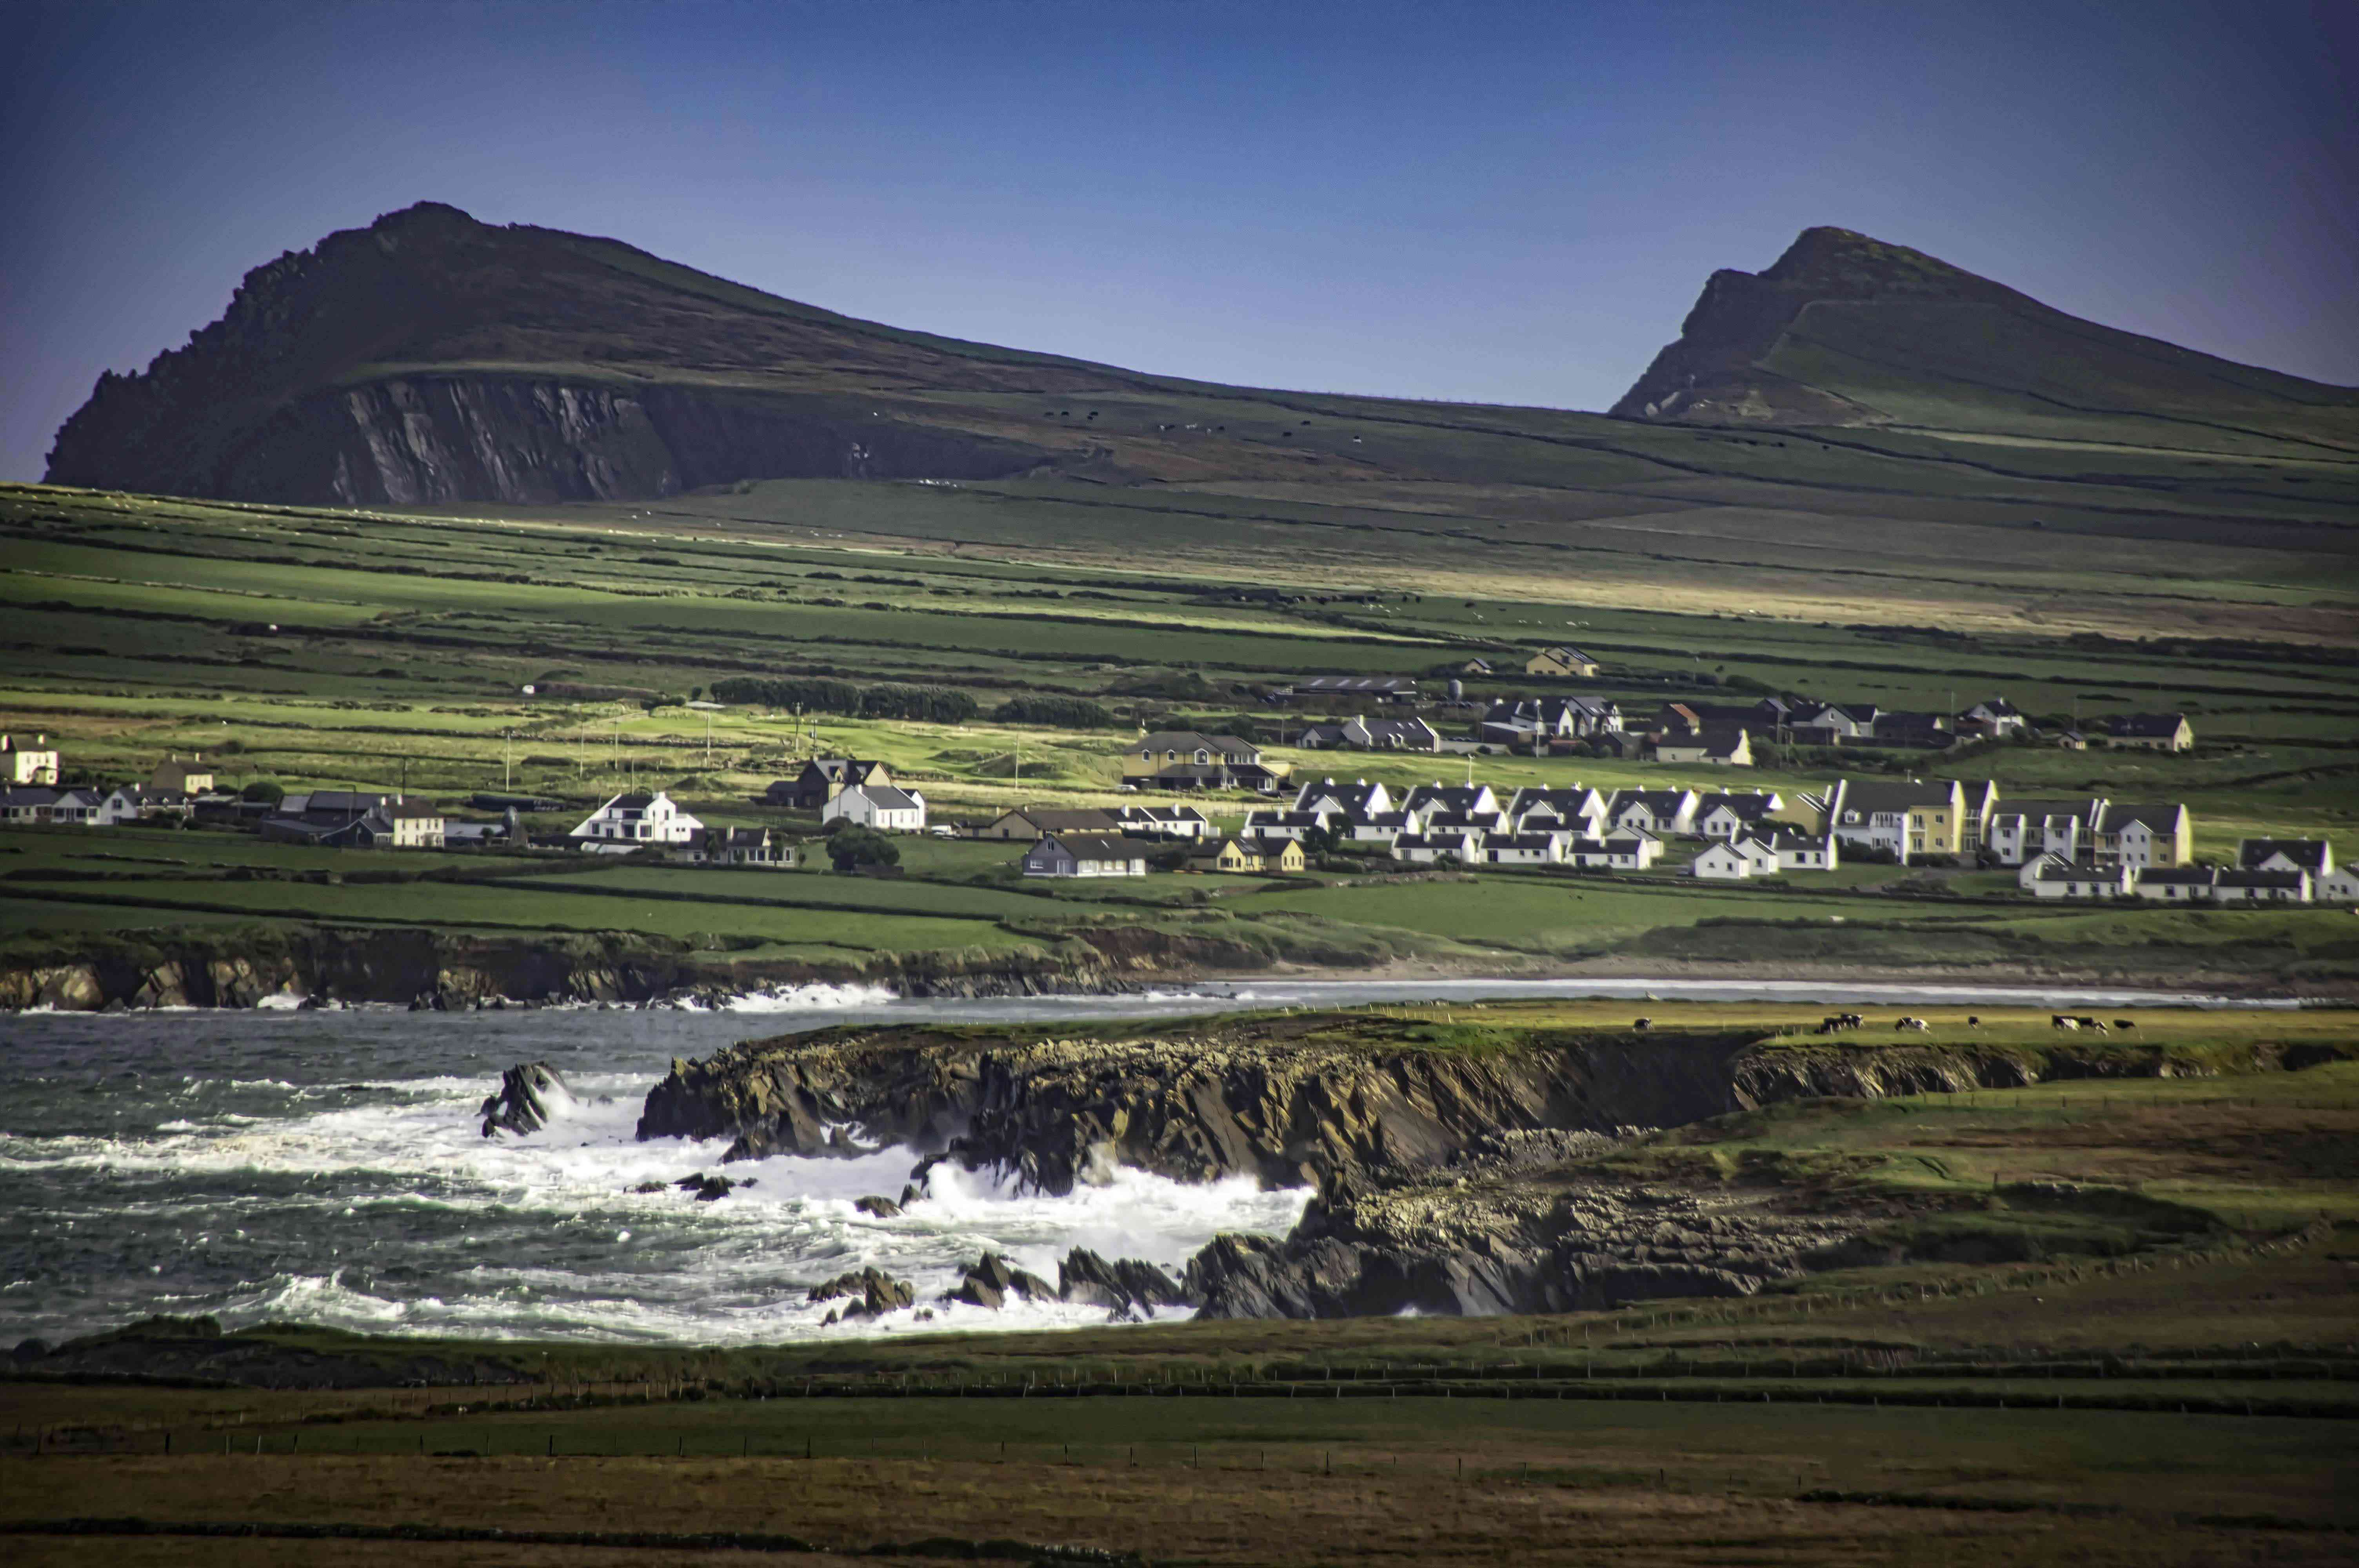 Houses along the coast of the Beara Peninsula